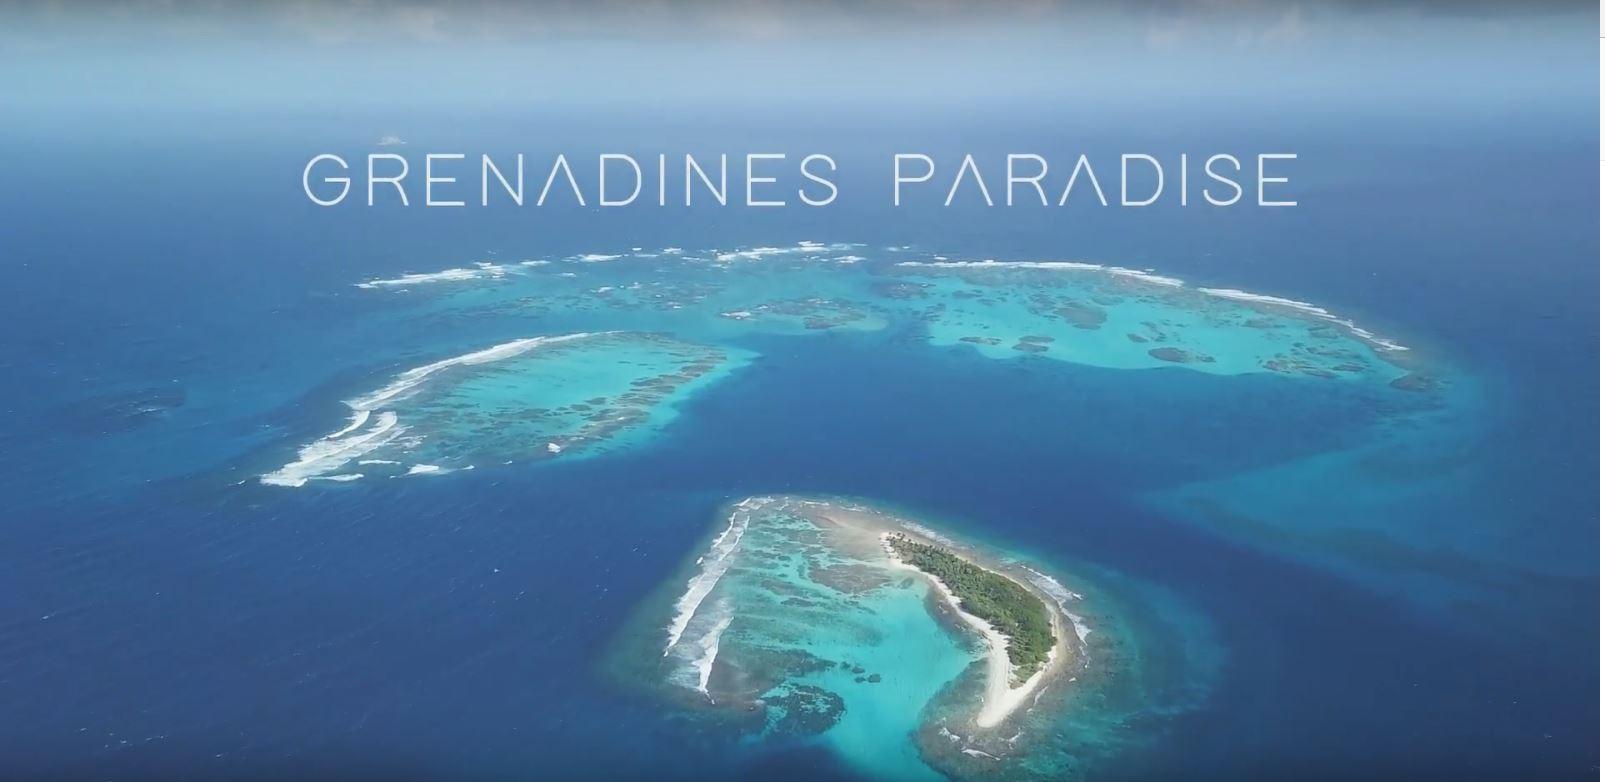 Grenadines Paradise